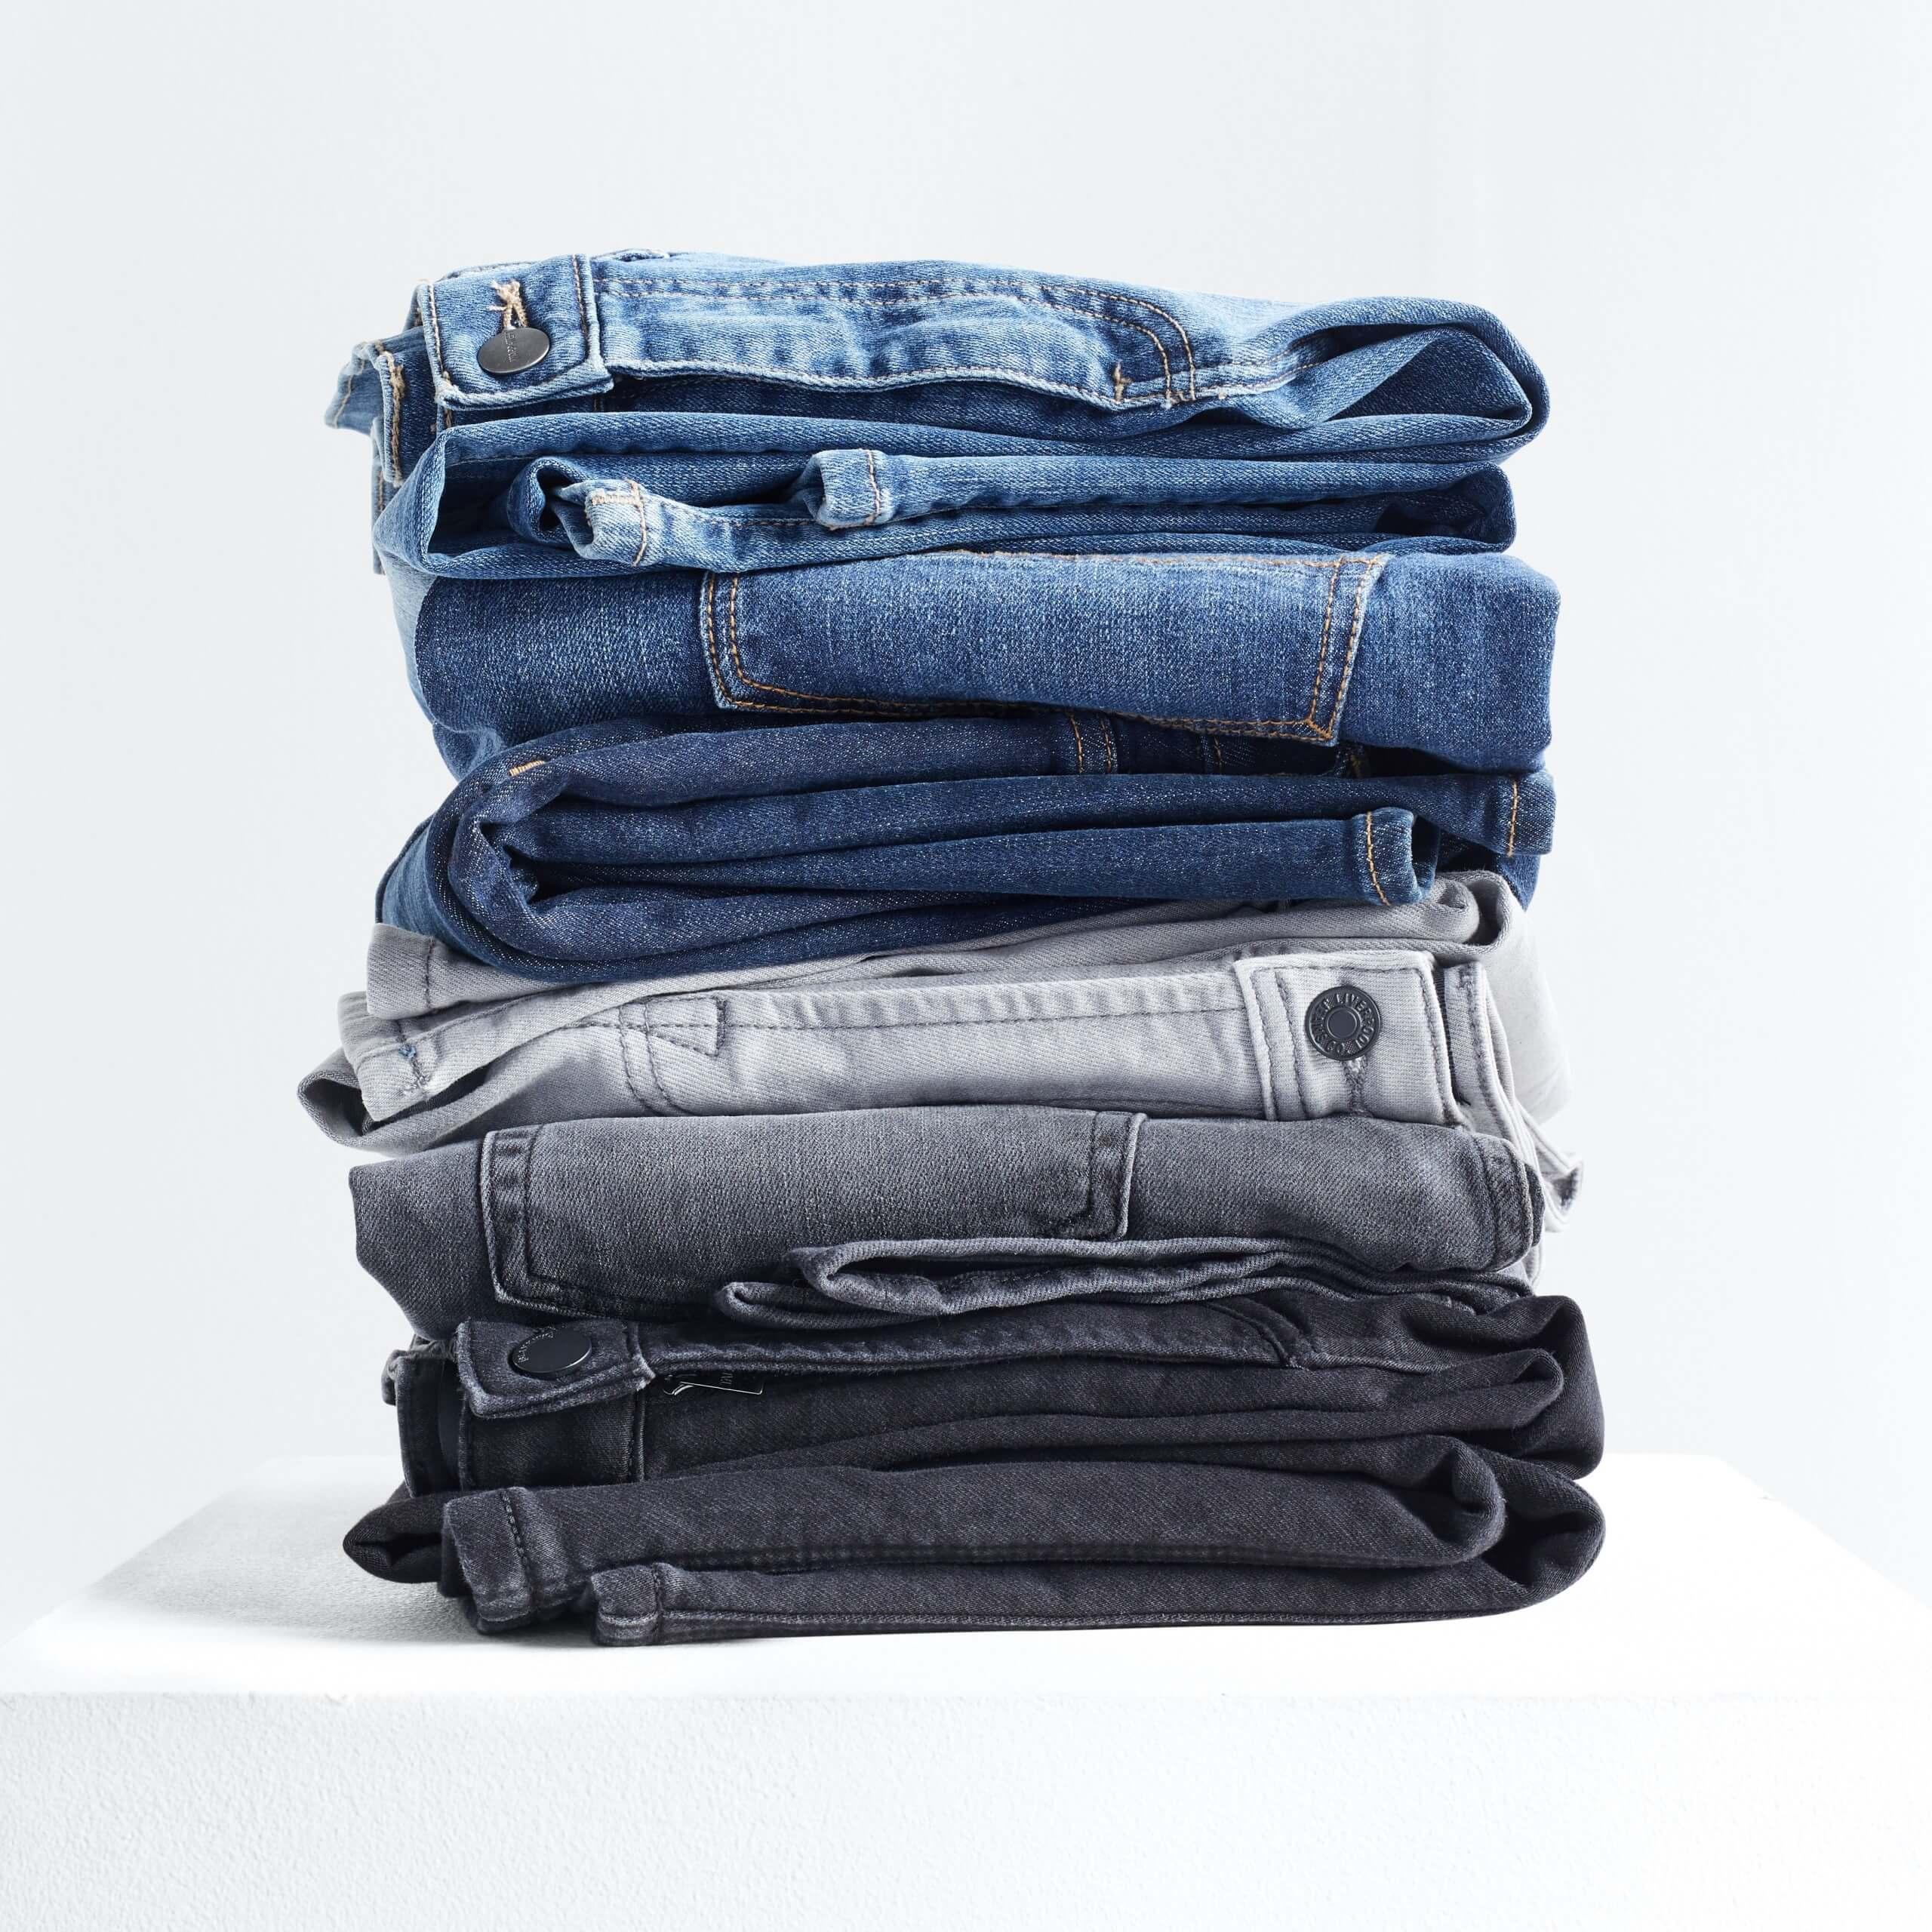 Stitch Fix Men's stack of jeans in light blue, dark blue, grey and black.